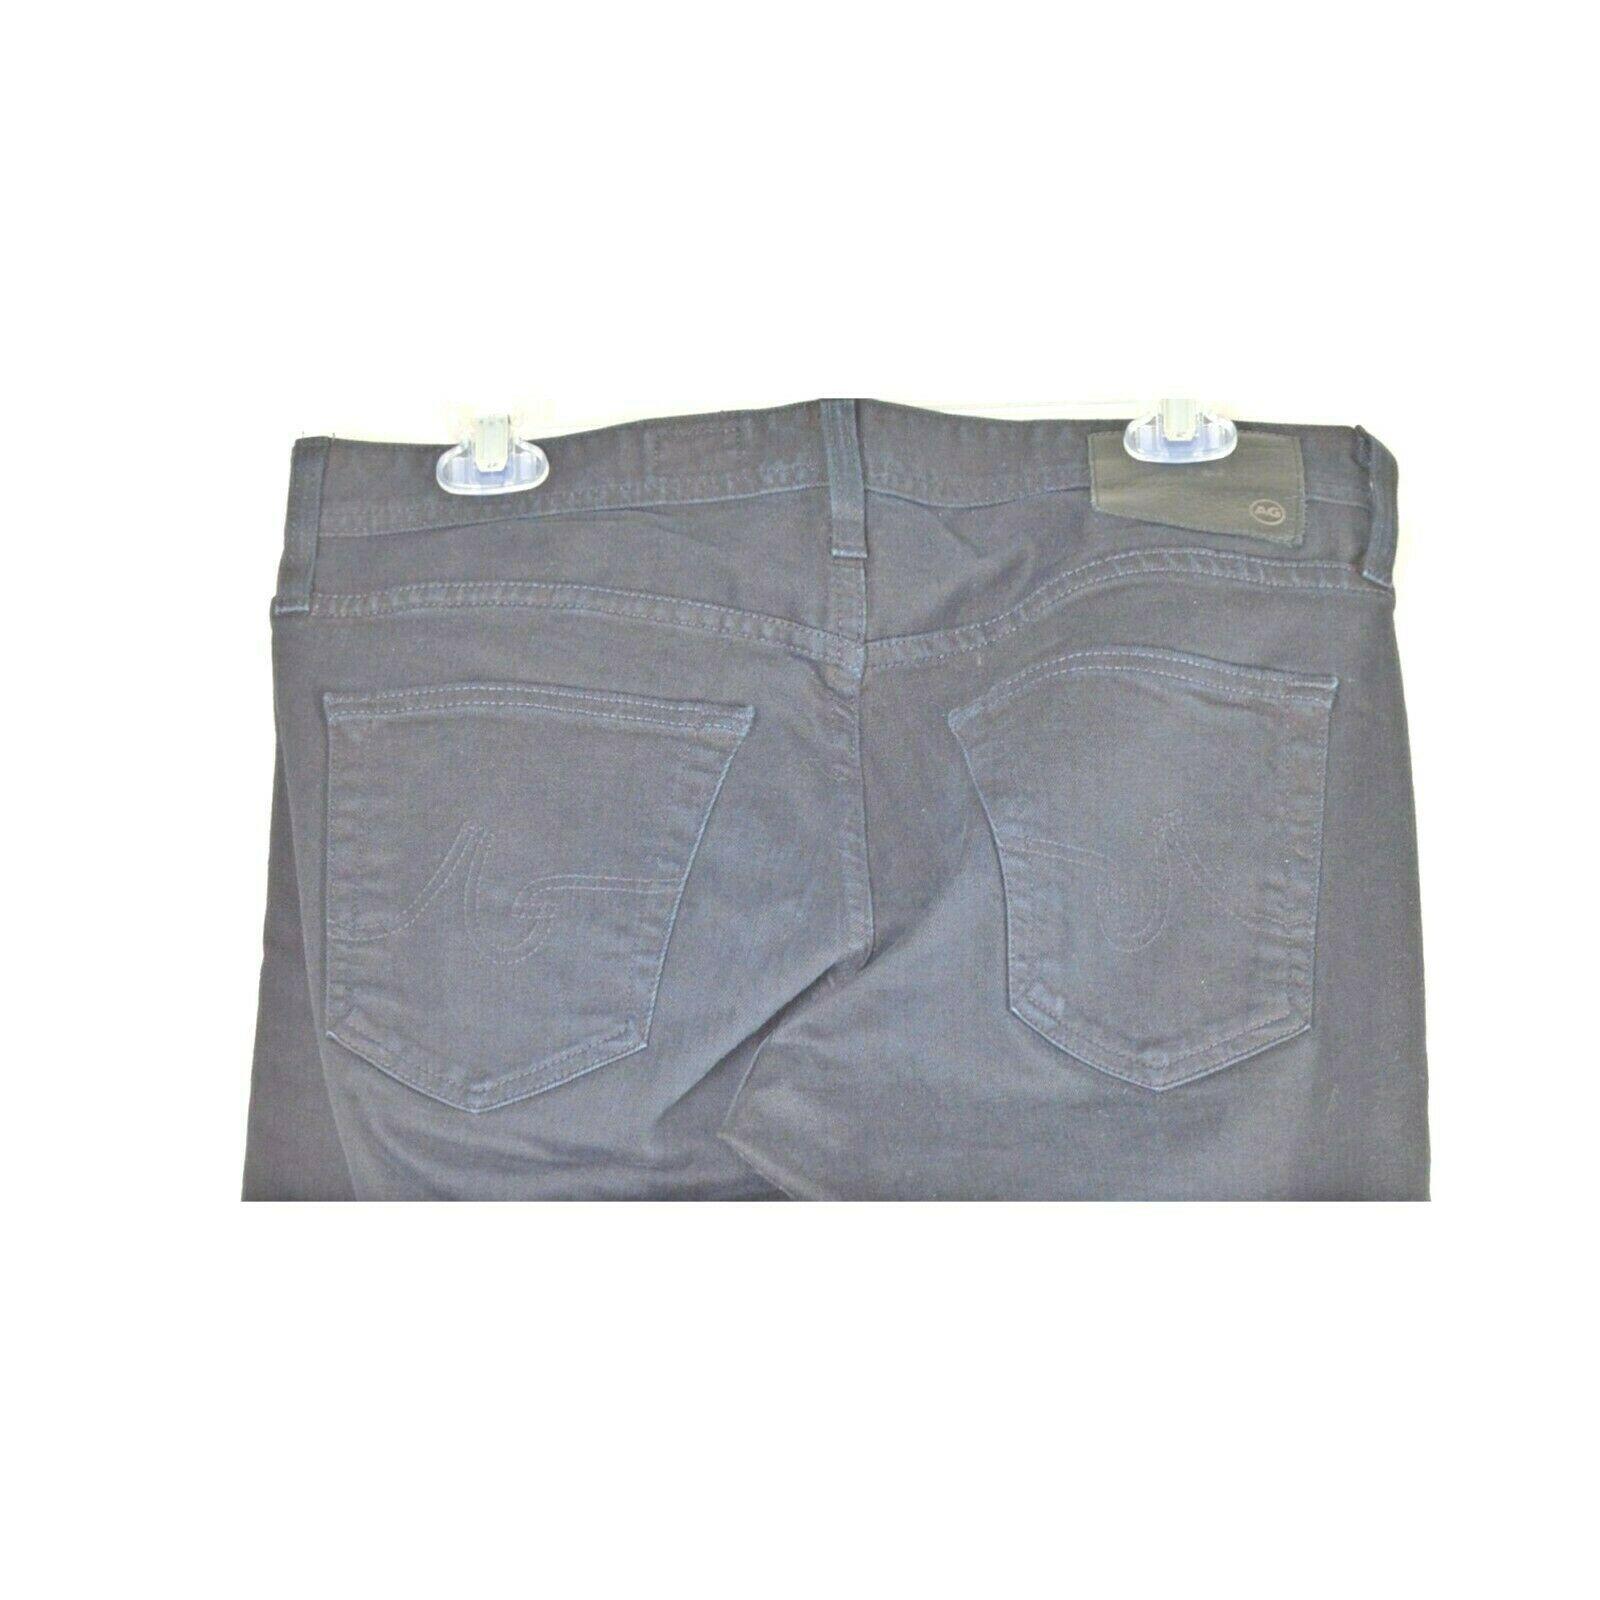 AG Adriano Goldschmied jeans 30 x 34 men Matchbox dark Slim Straight tall unique image 3